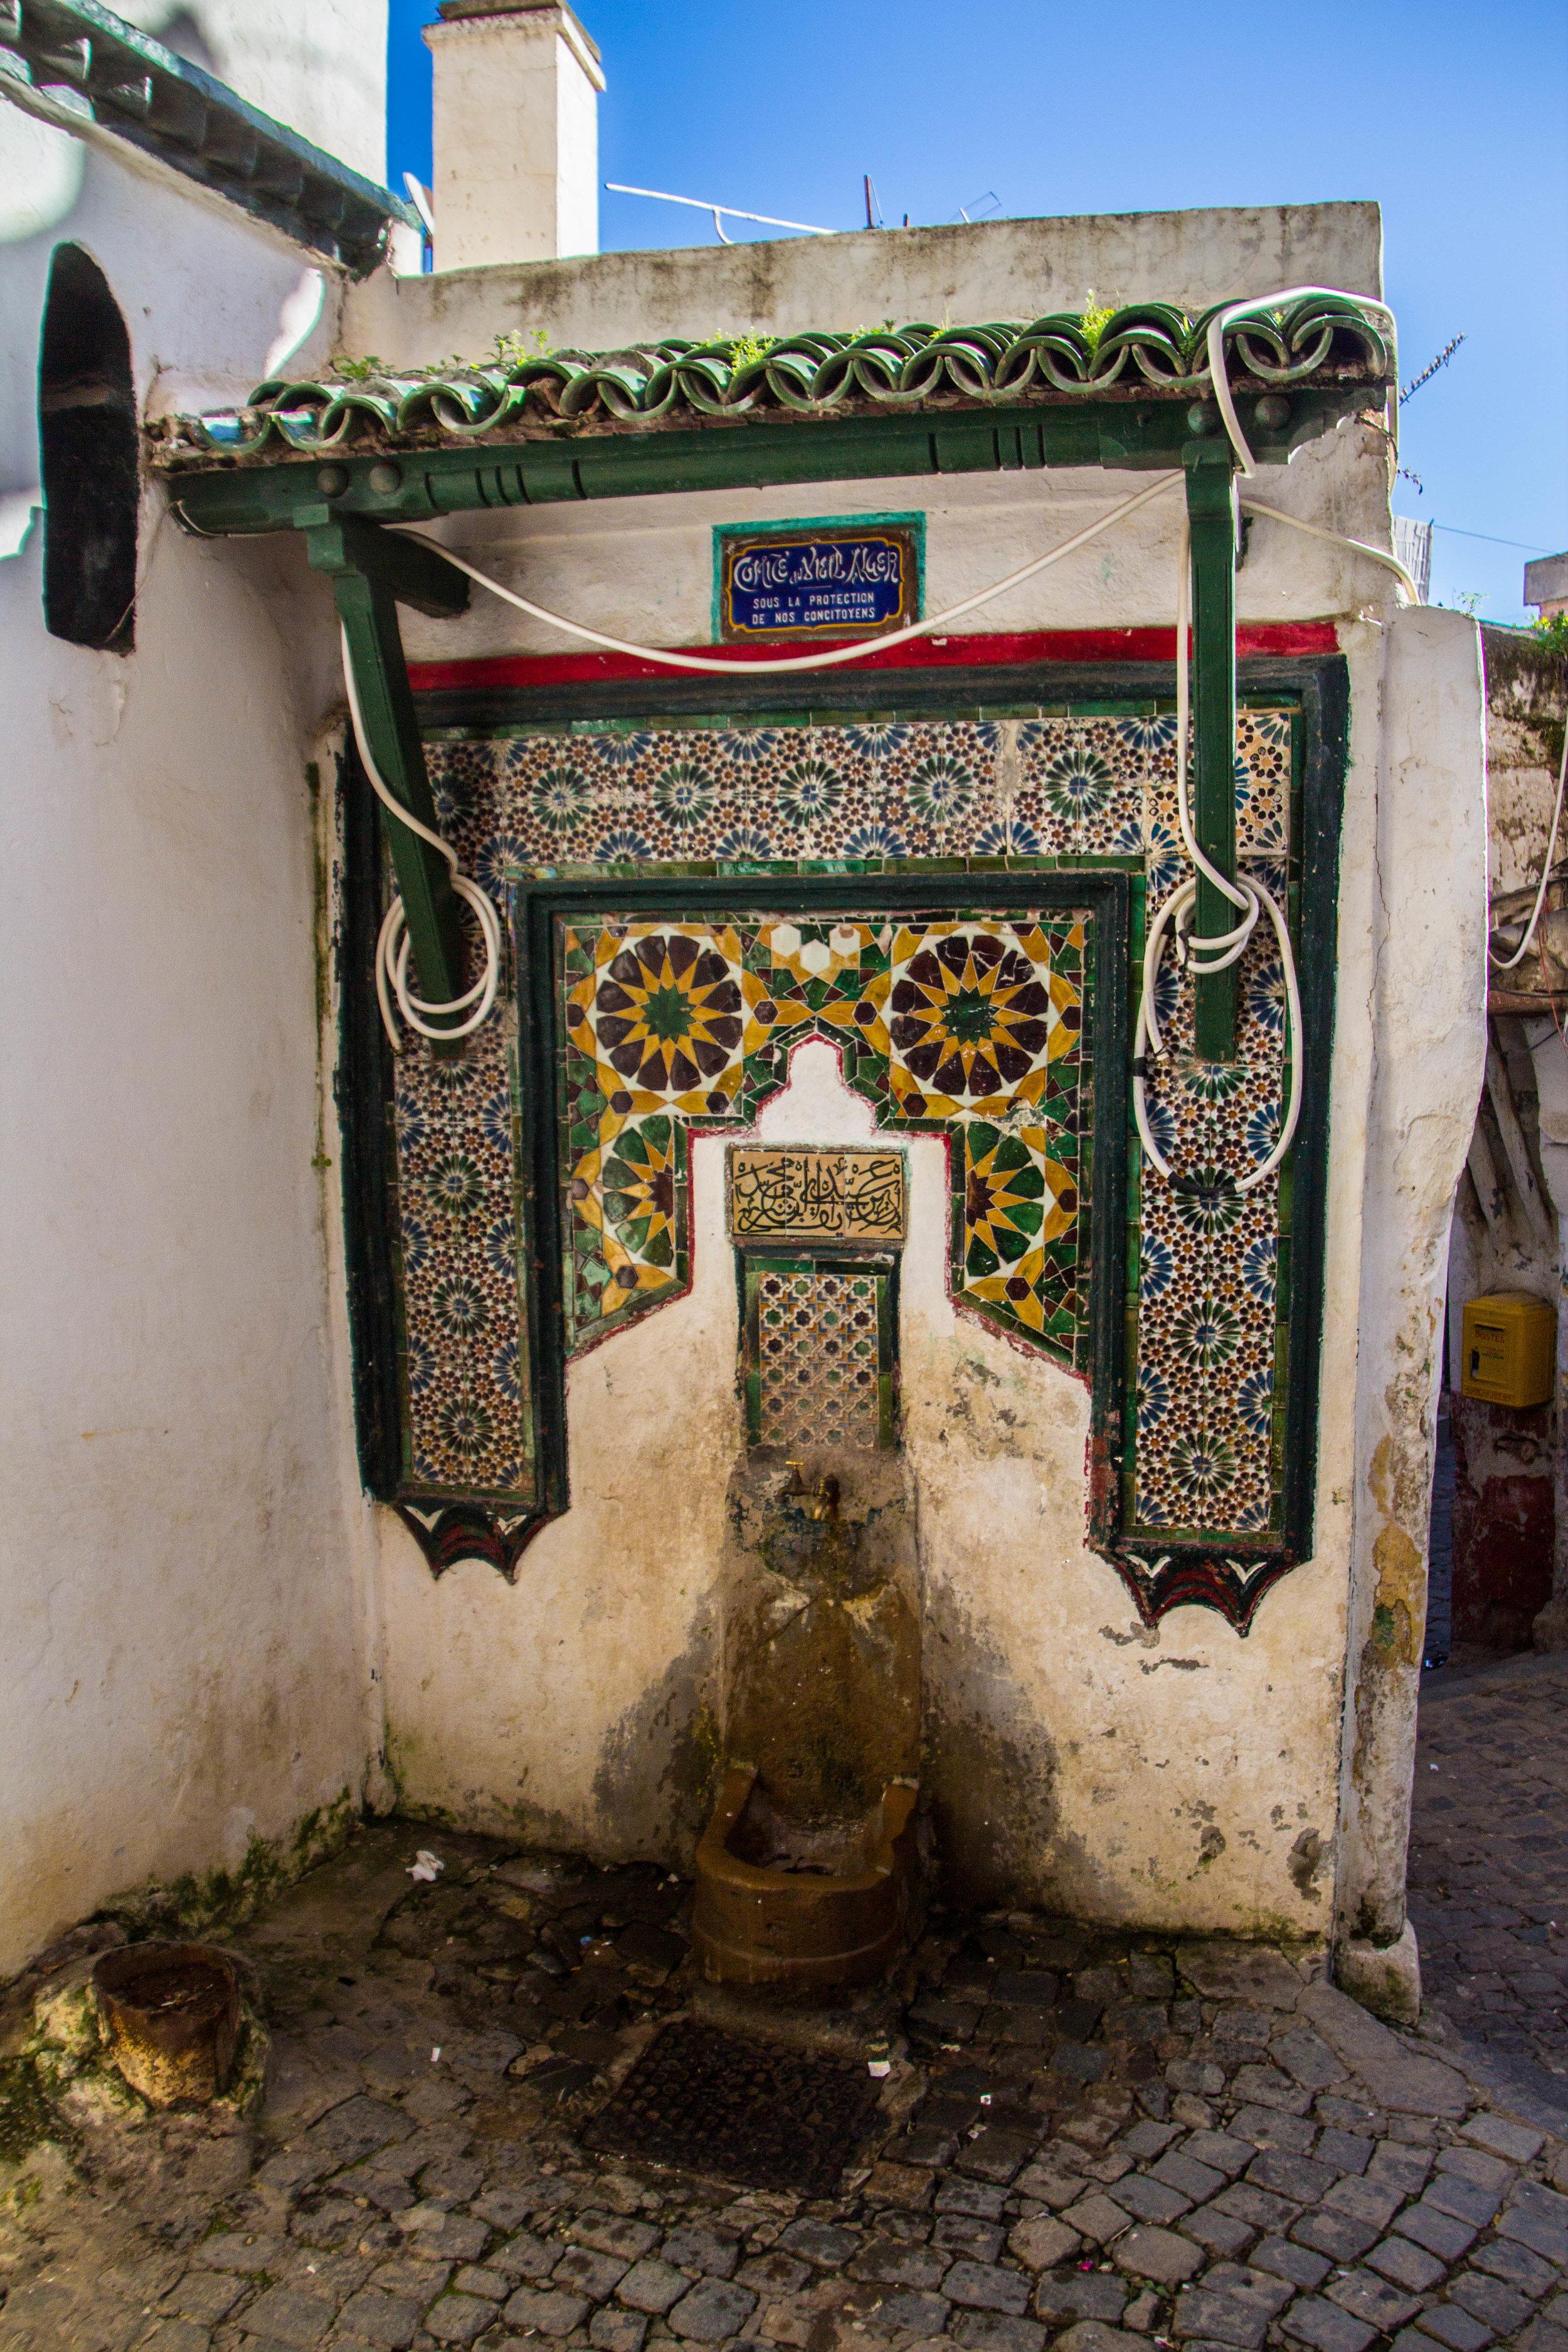 casbah-photography-algiers-algeria-alger-15.jpg